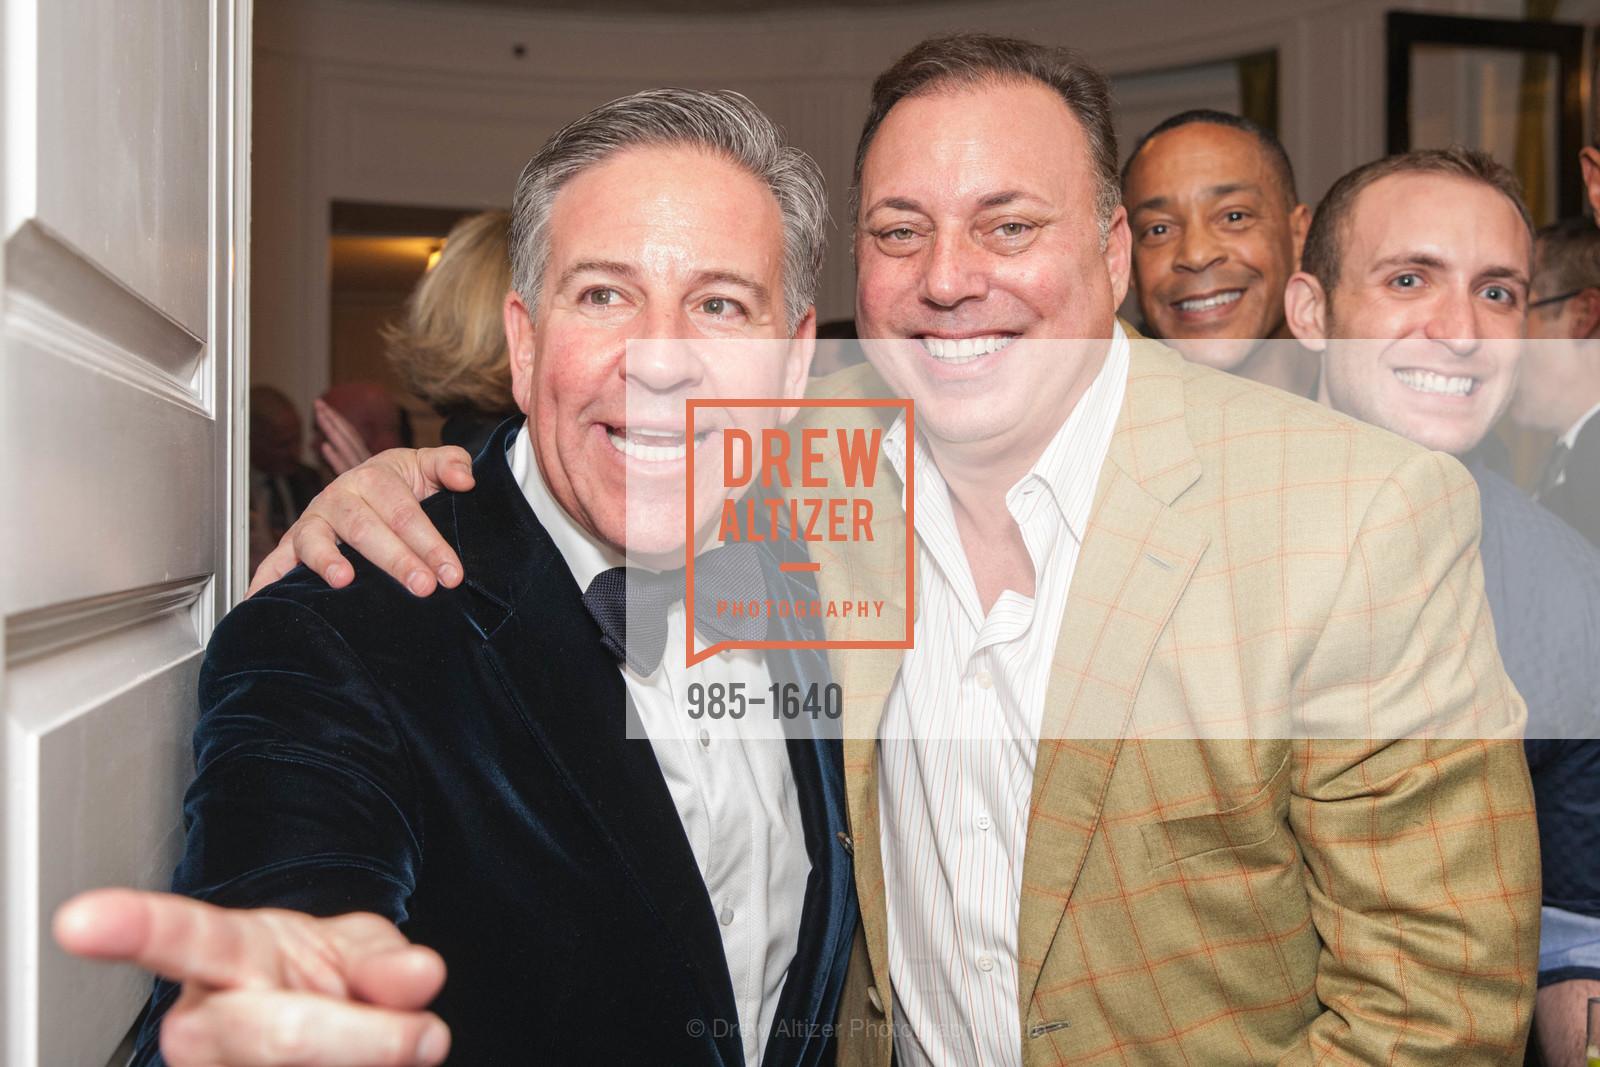 Gregg Lynn, Gregg Lynn and Glenn Risso's Engagement Party, Farimont Hotel, Penthouse. San Francisco, California, December 7th, 2016